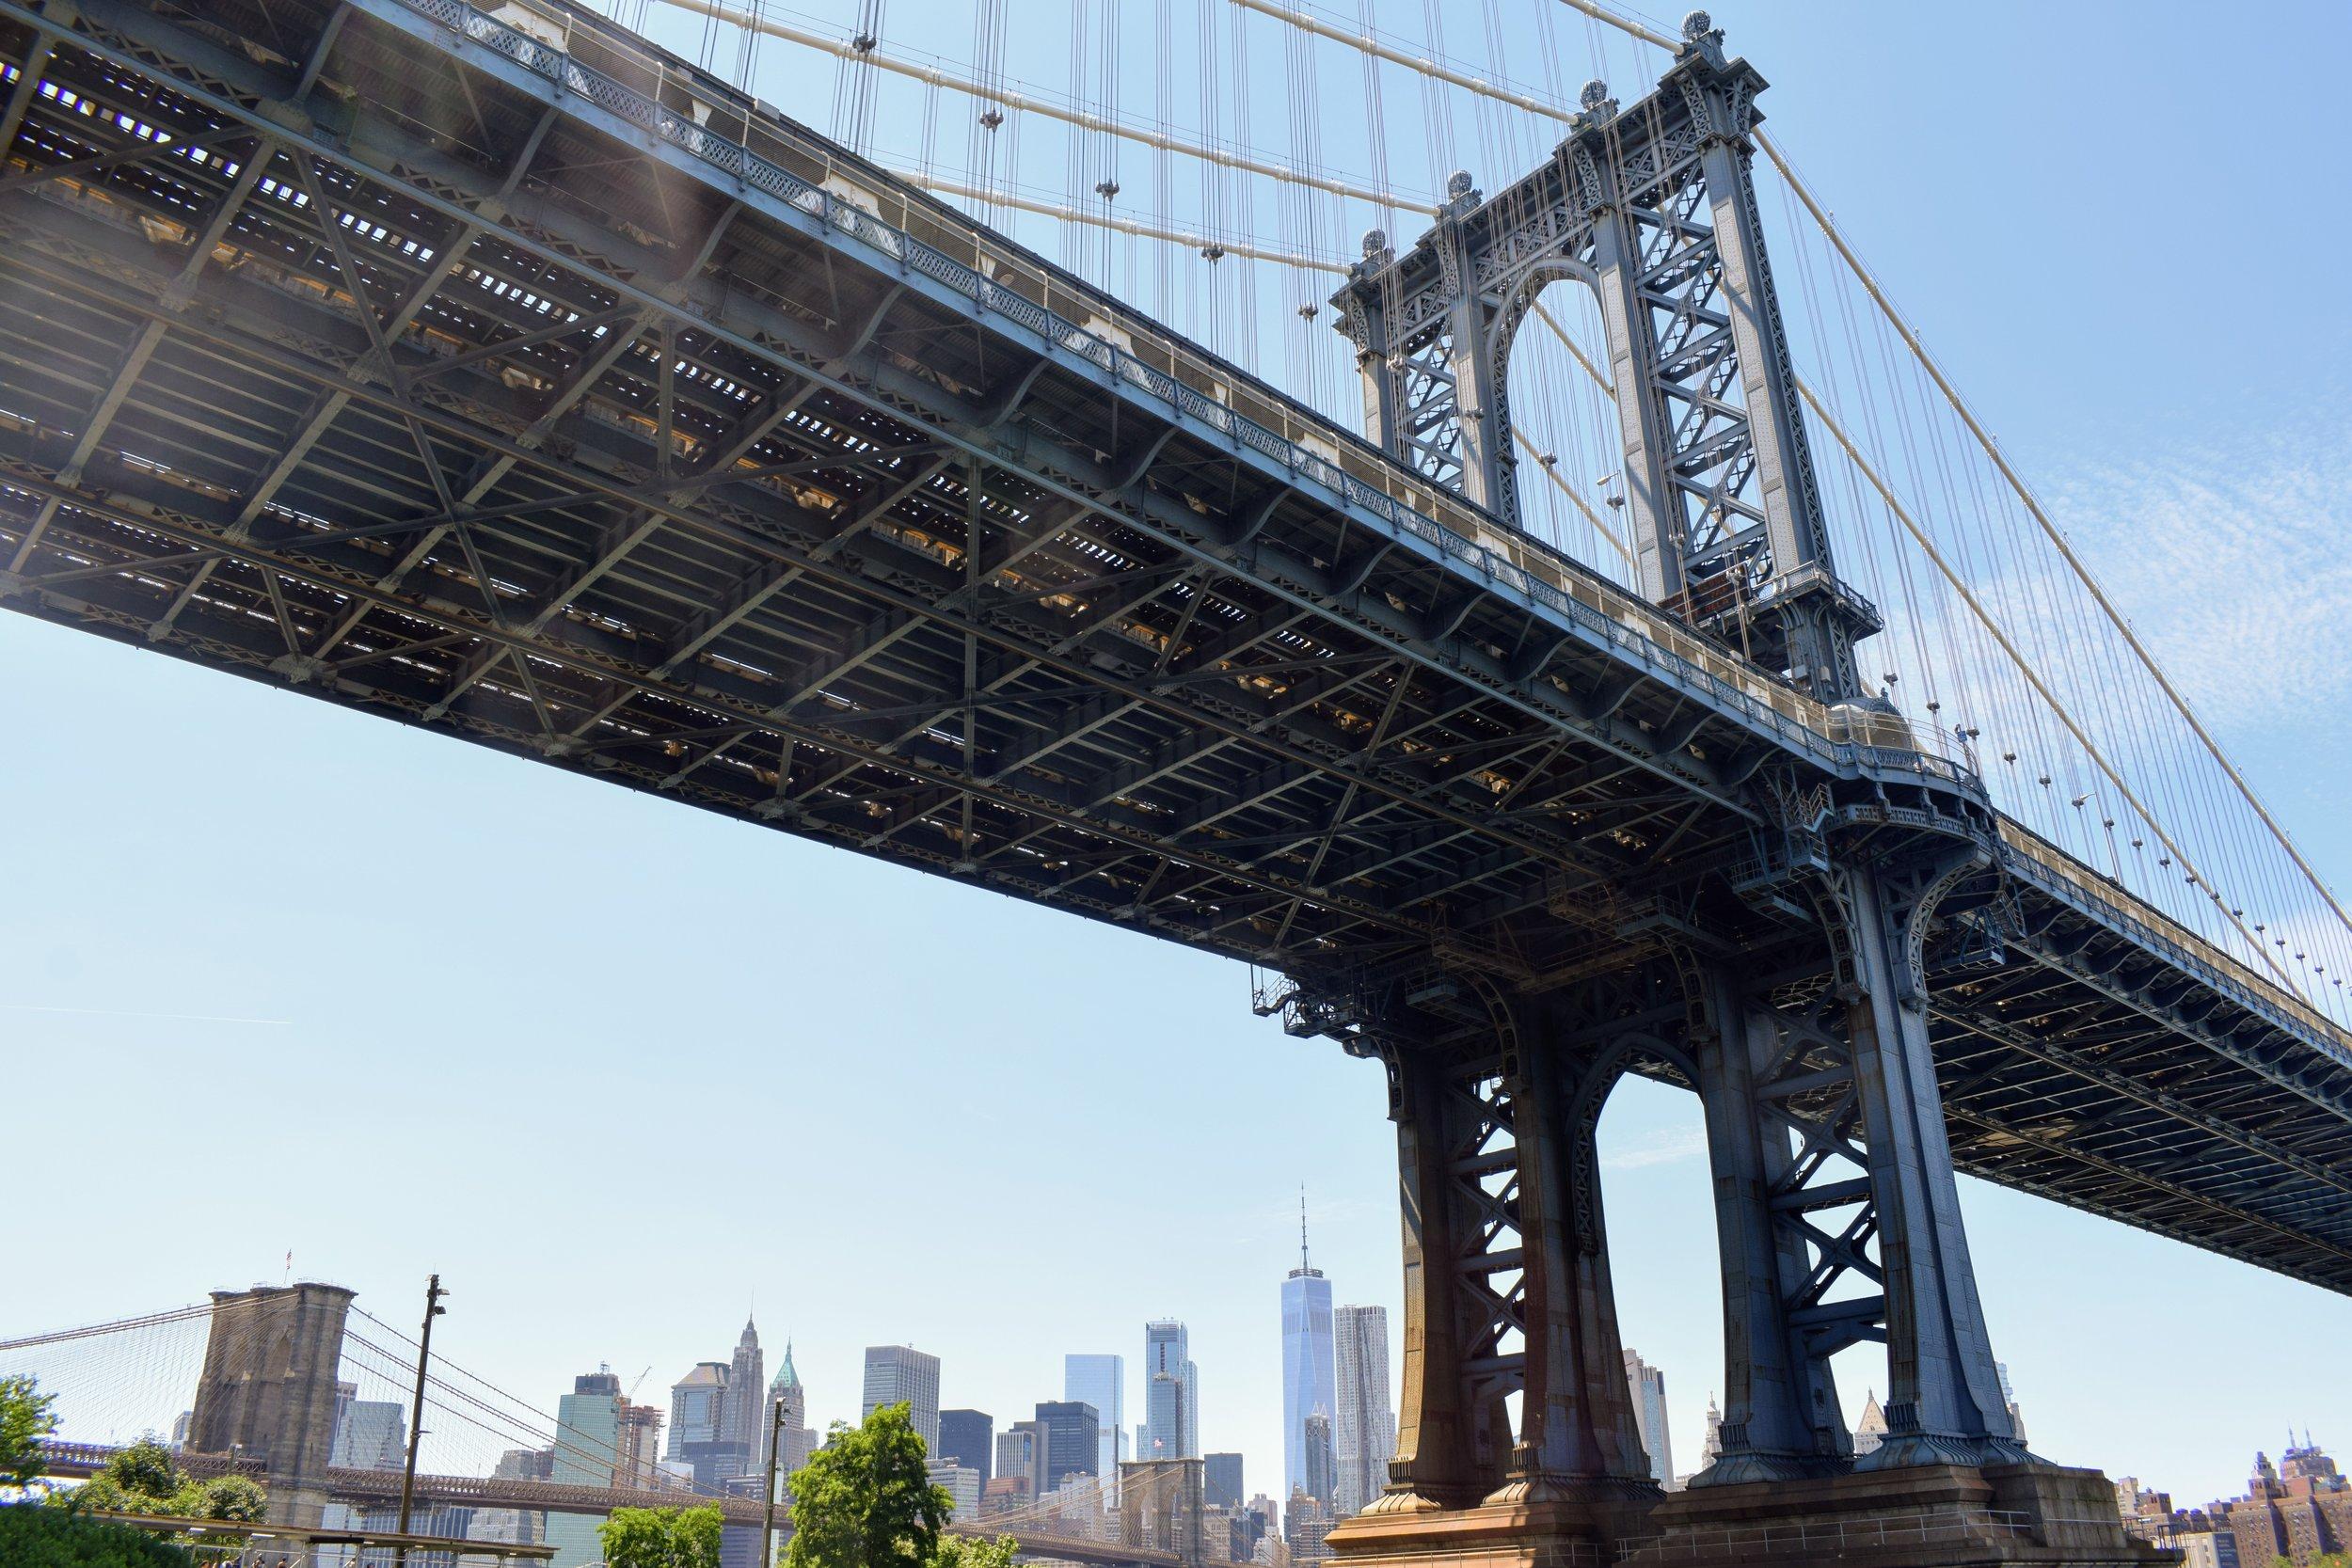 The Manhattan Bridge with One World Trade Center visible below.